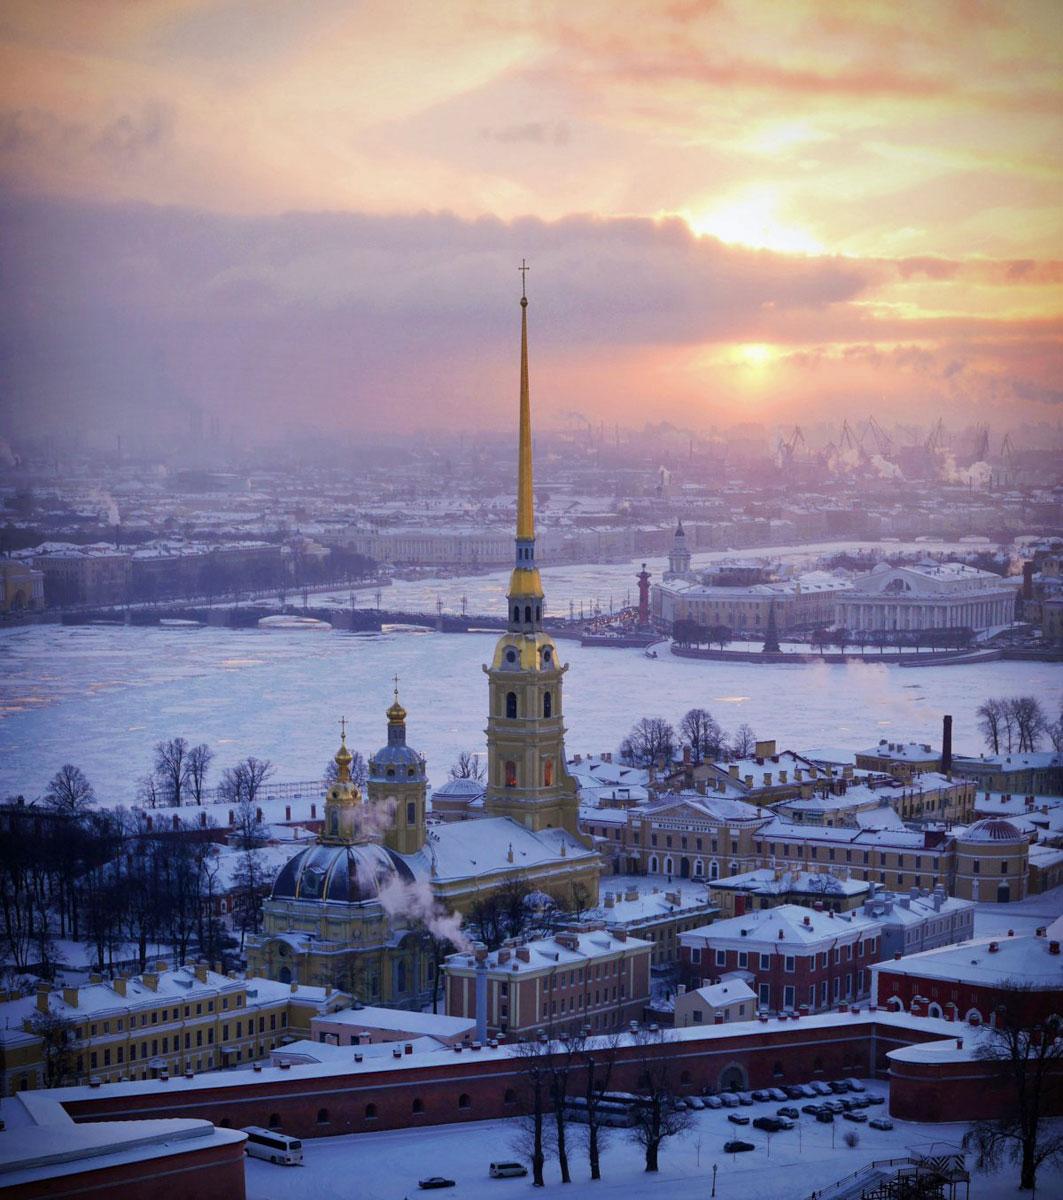 Saint Peter və Paul Kilsəsi, Sankt Peterburq, Rusiya